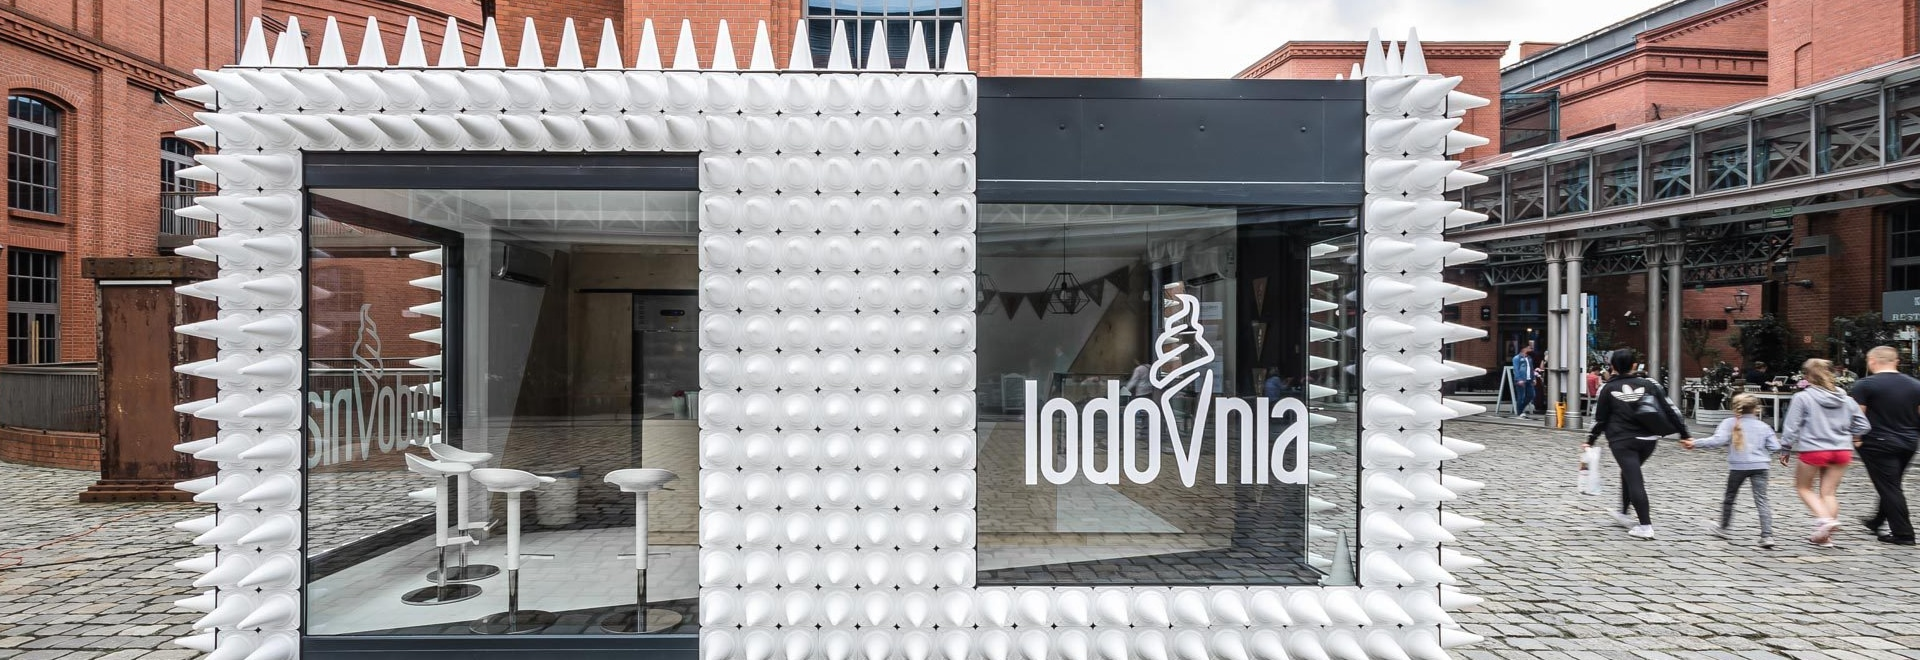 Almost 1,000 Cones Cover This Ice Cream Shop In Poland